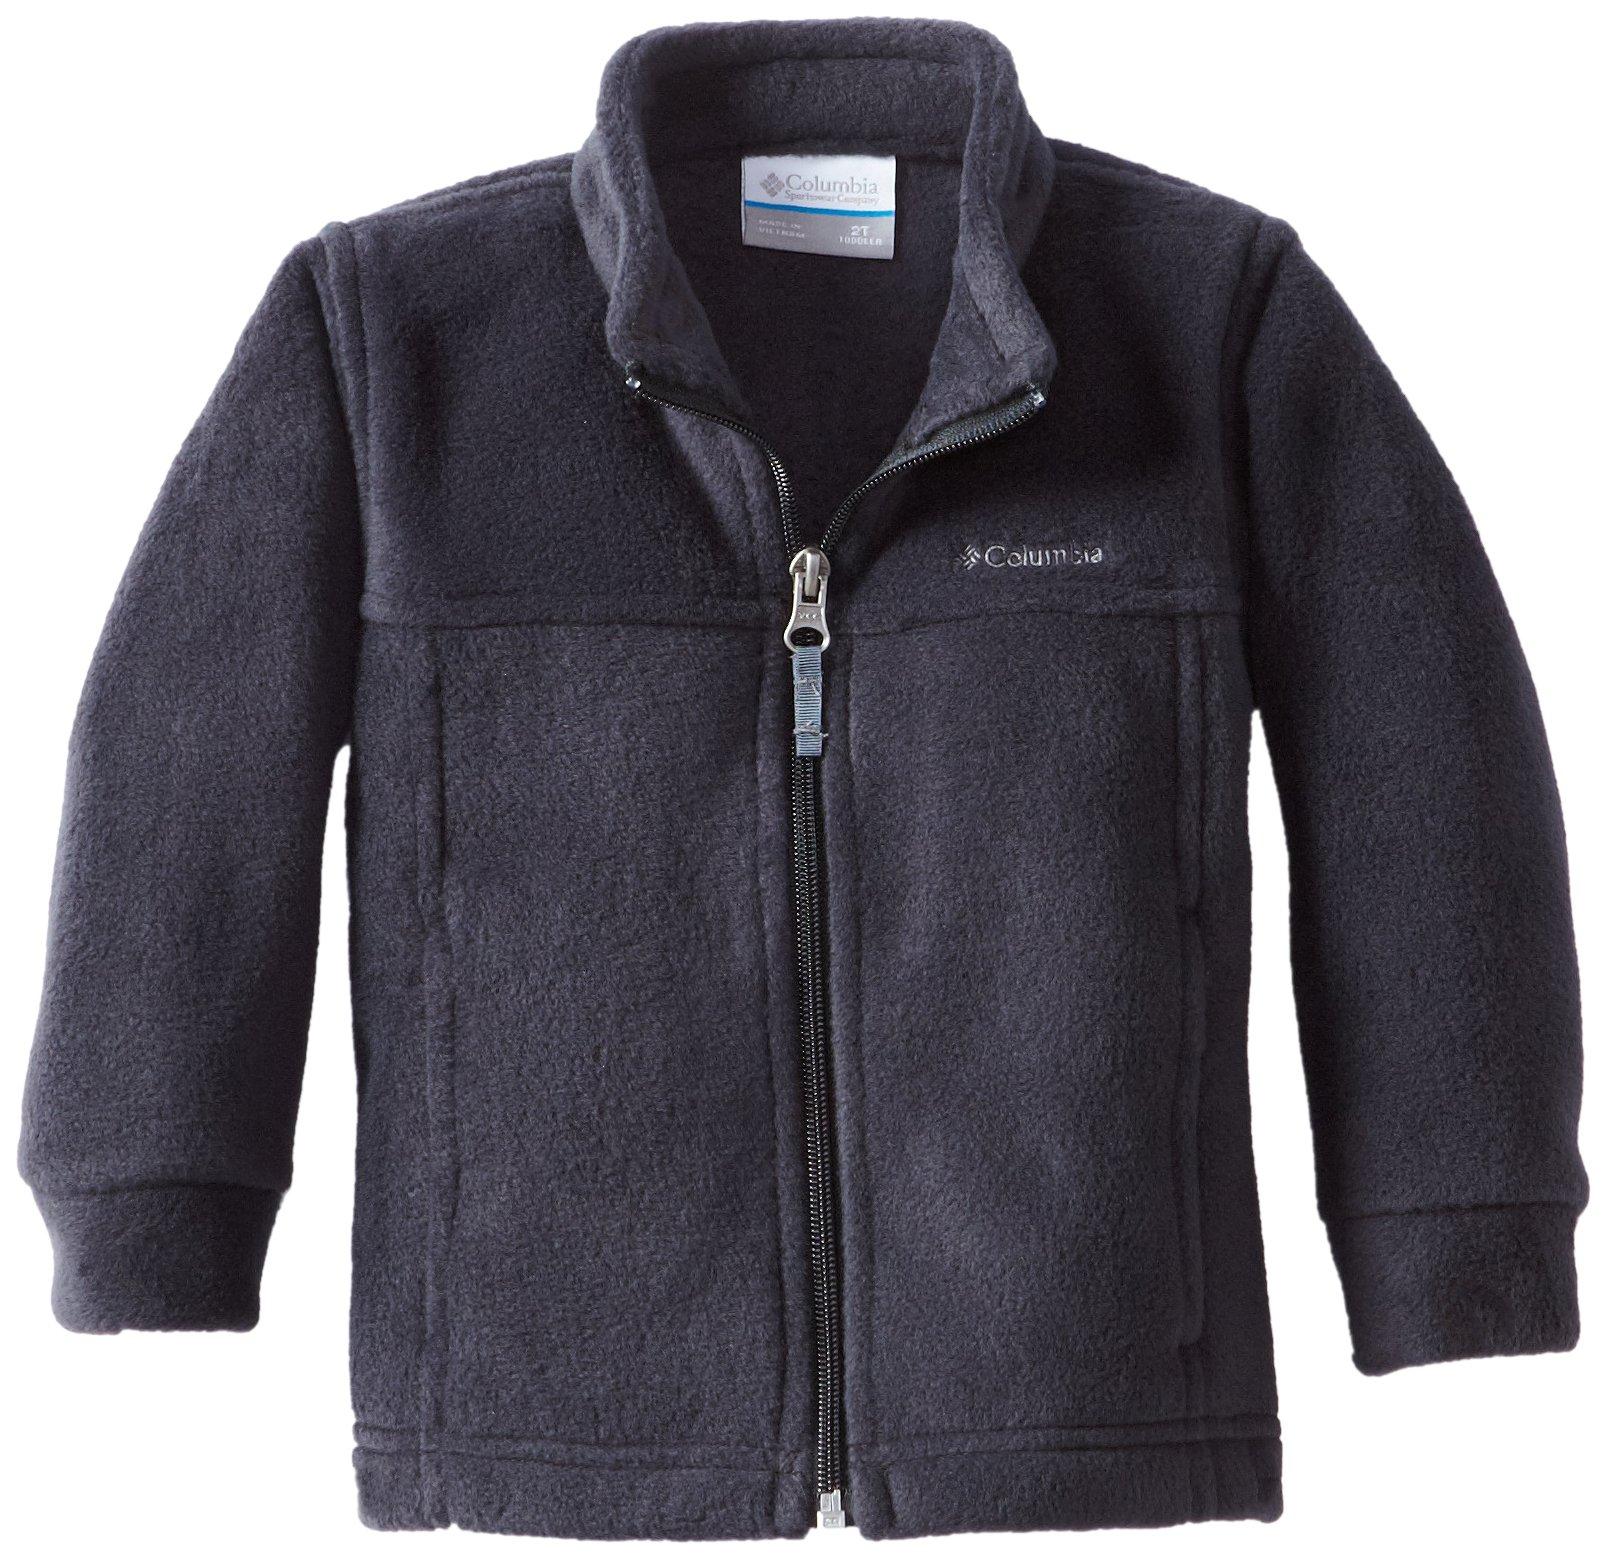 Columbia Little Boys' Steens MT II Fleece Jacket, Black, 4T